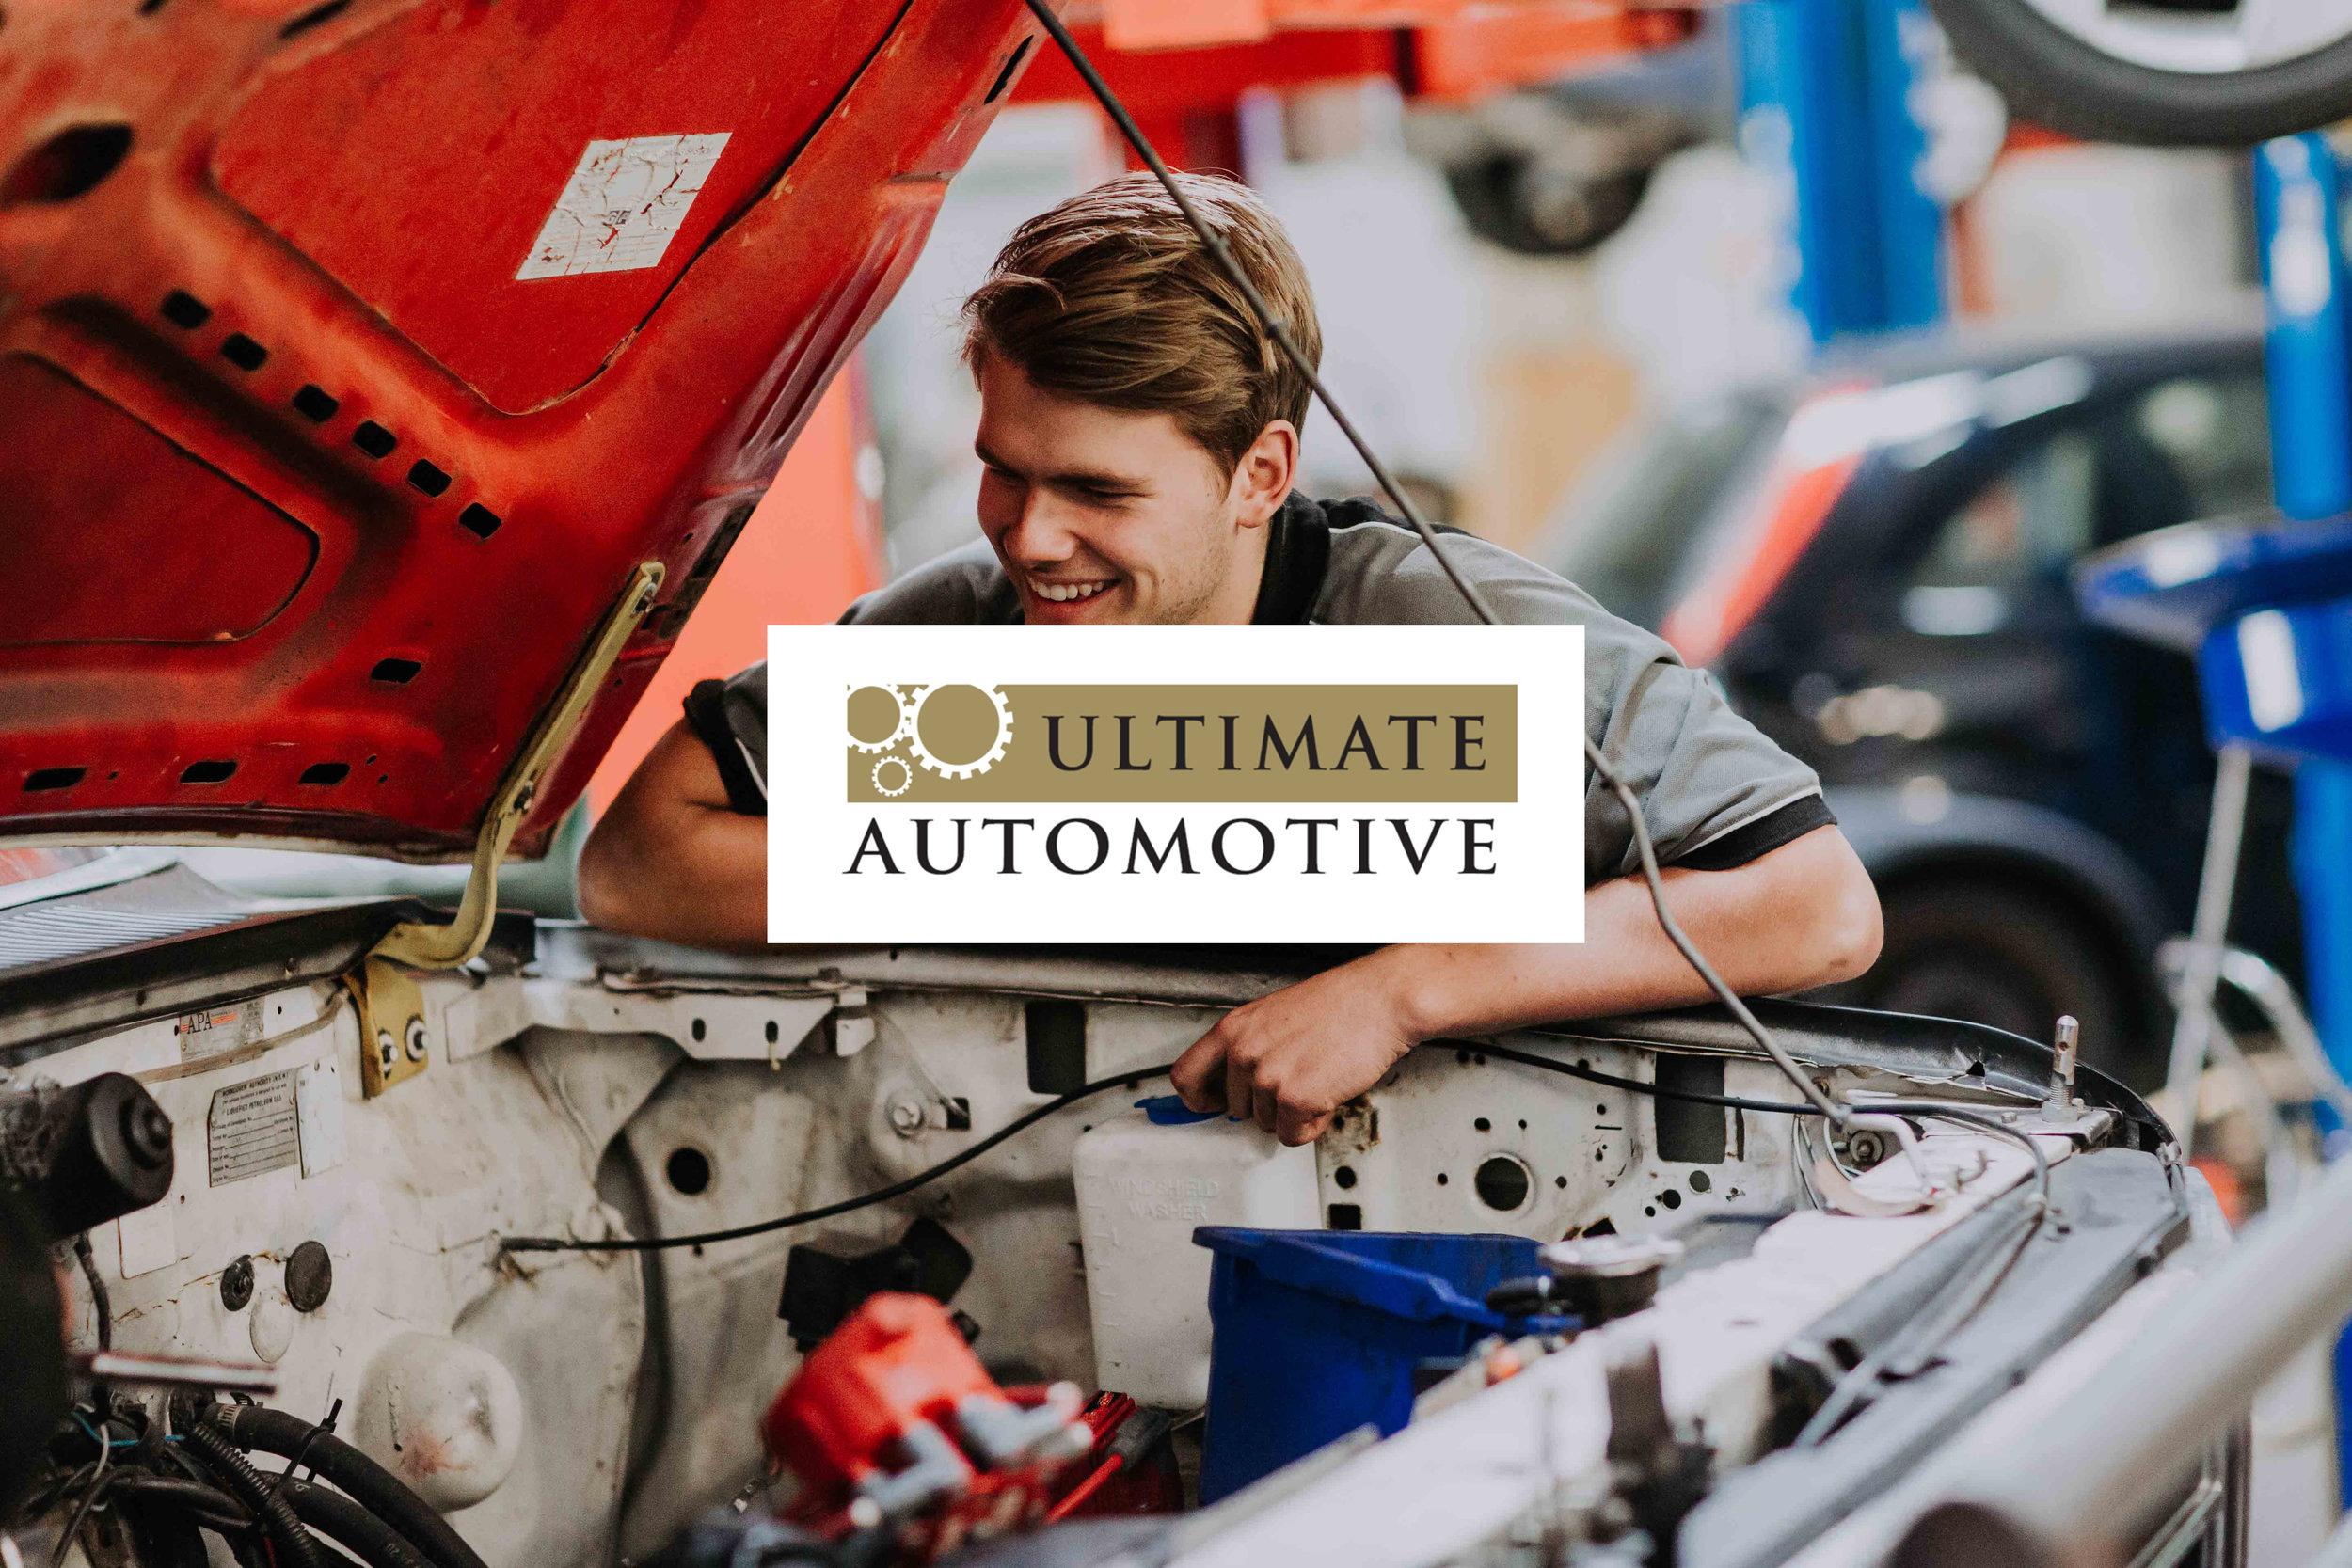 Ultimate Automotive Commercial Website Promotion-6 copy.jpg